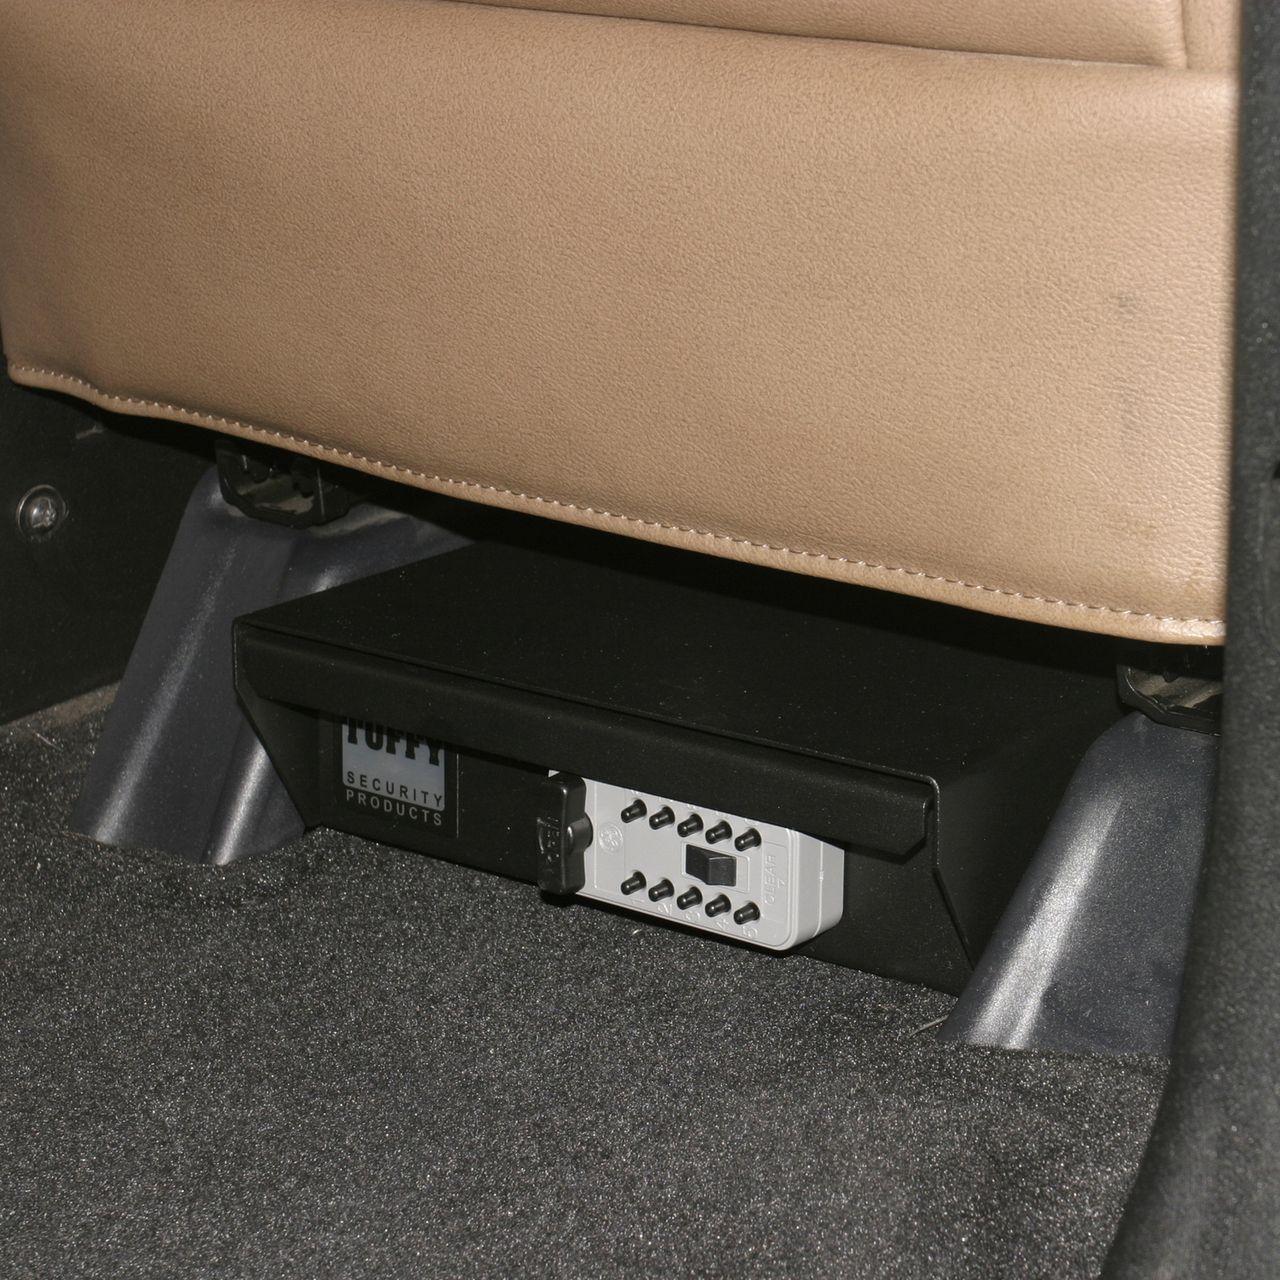 NOVISauto Autosafe Einschubkassette Wertsachensafe Fahrzeug und Camping Kombinationsschloss